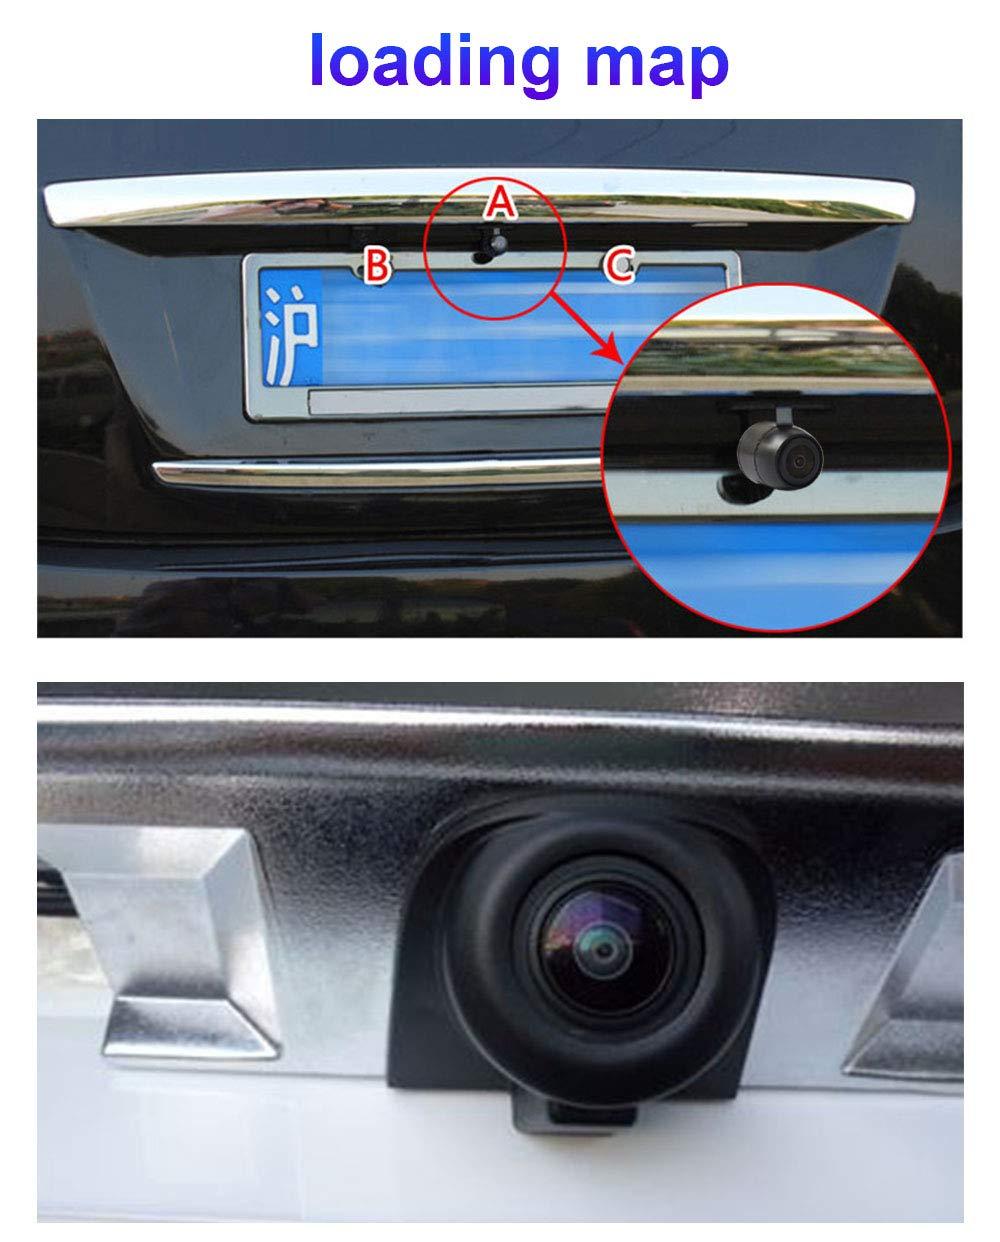 Chip impermeable del CCD de la c/ámara del rev/és de la vista posterior del coche del veh/ículo con la visi/ón nocturna,vista frontal o vista lateral